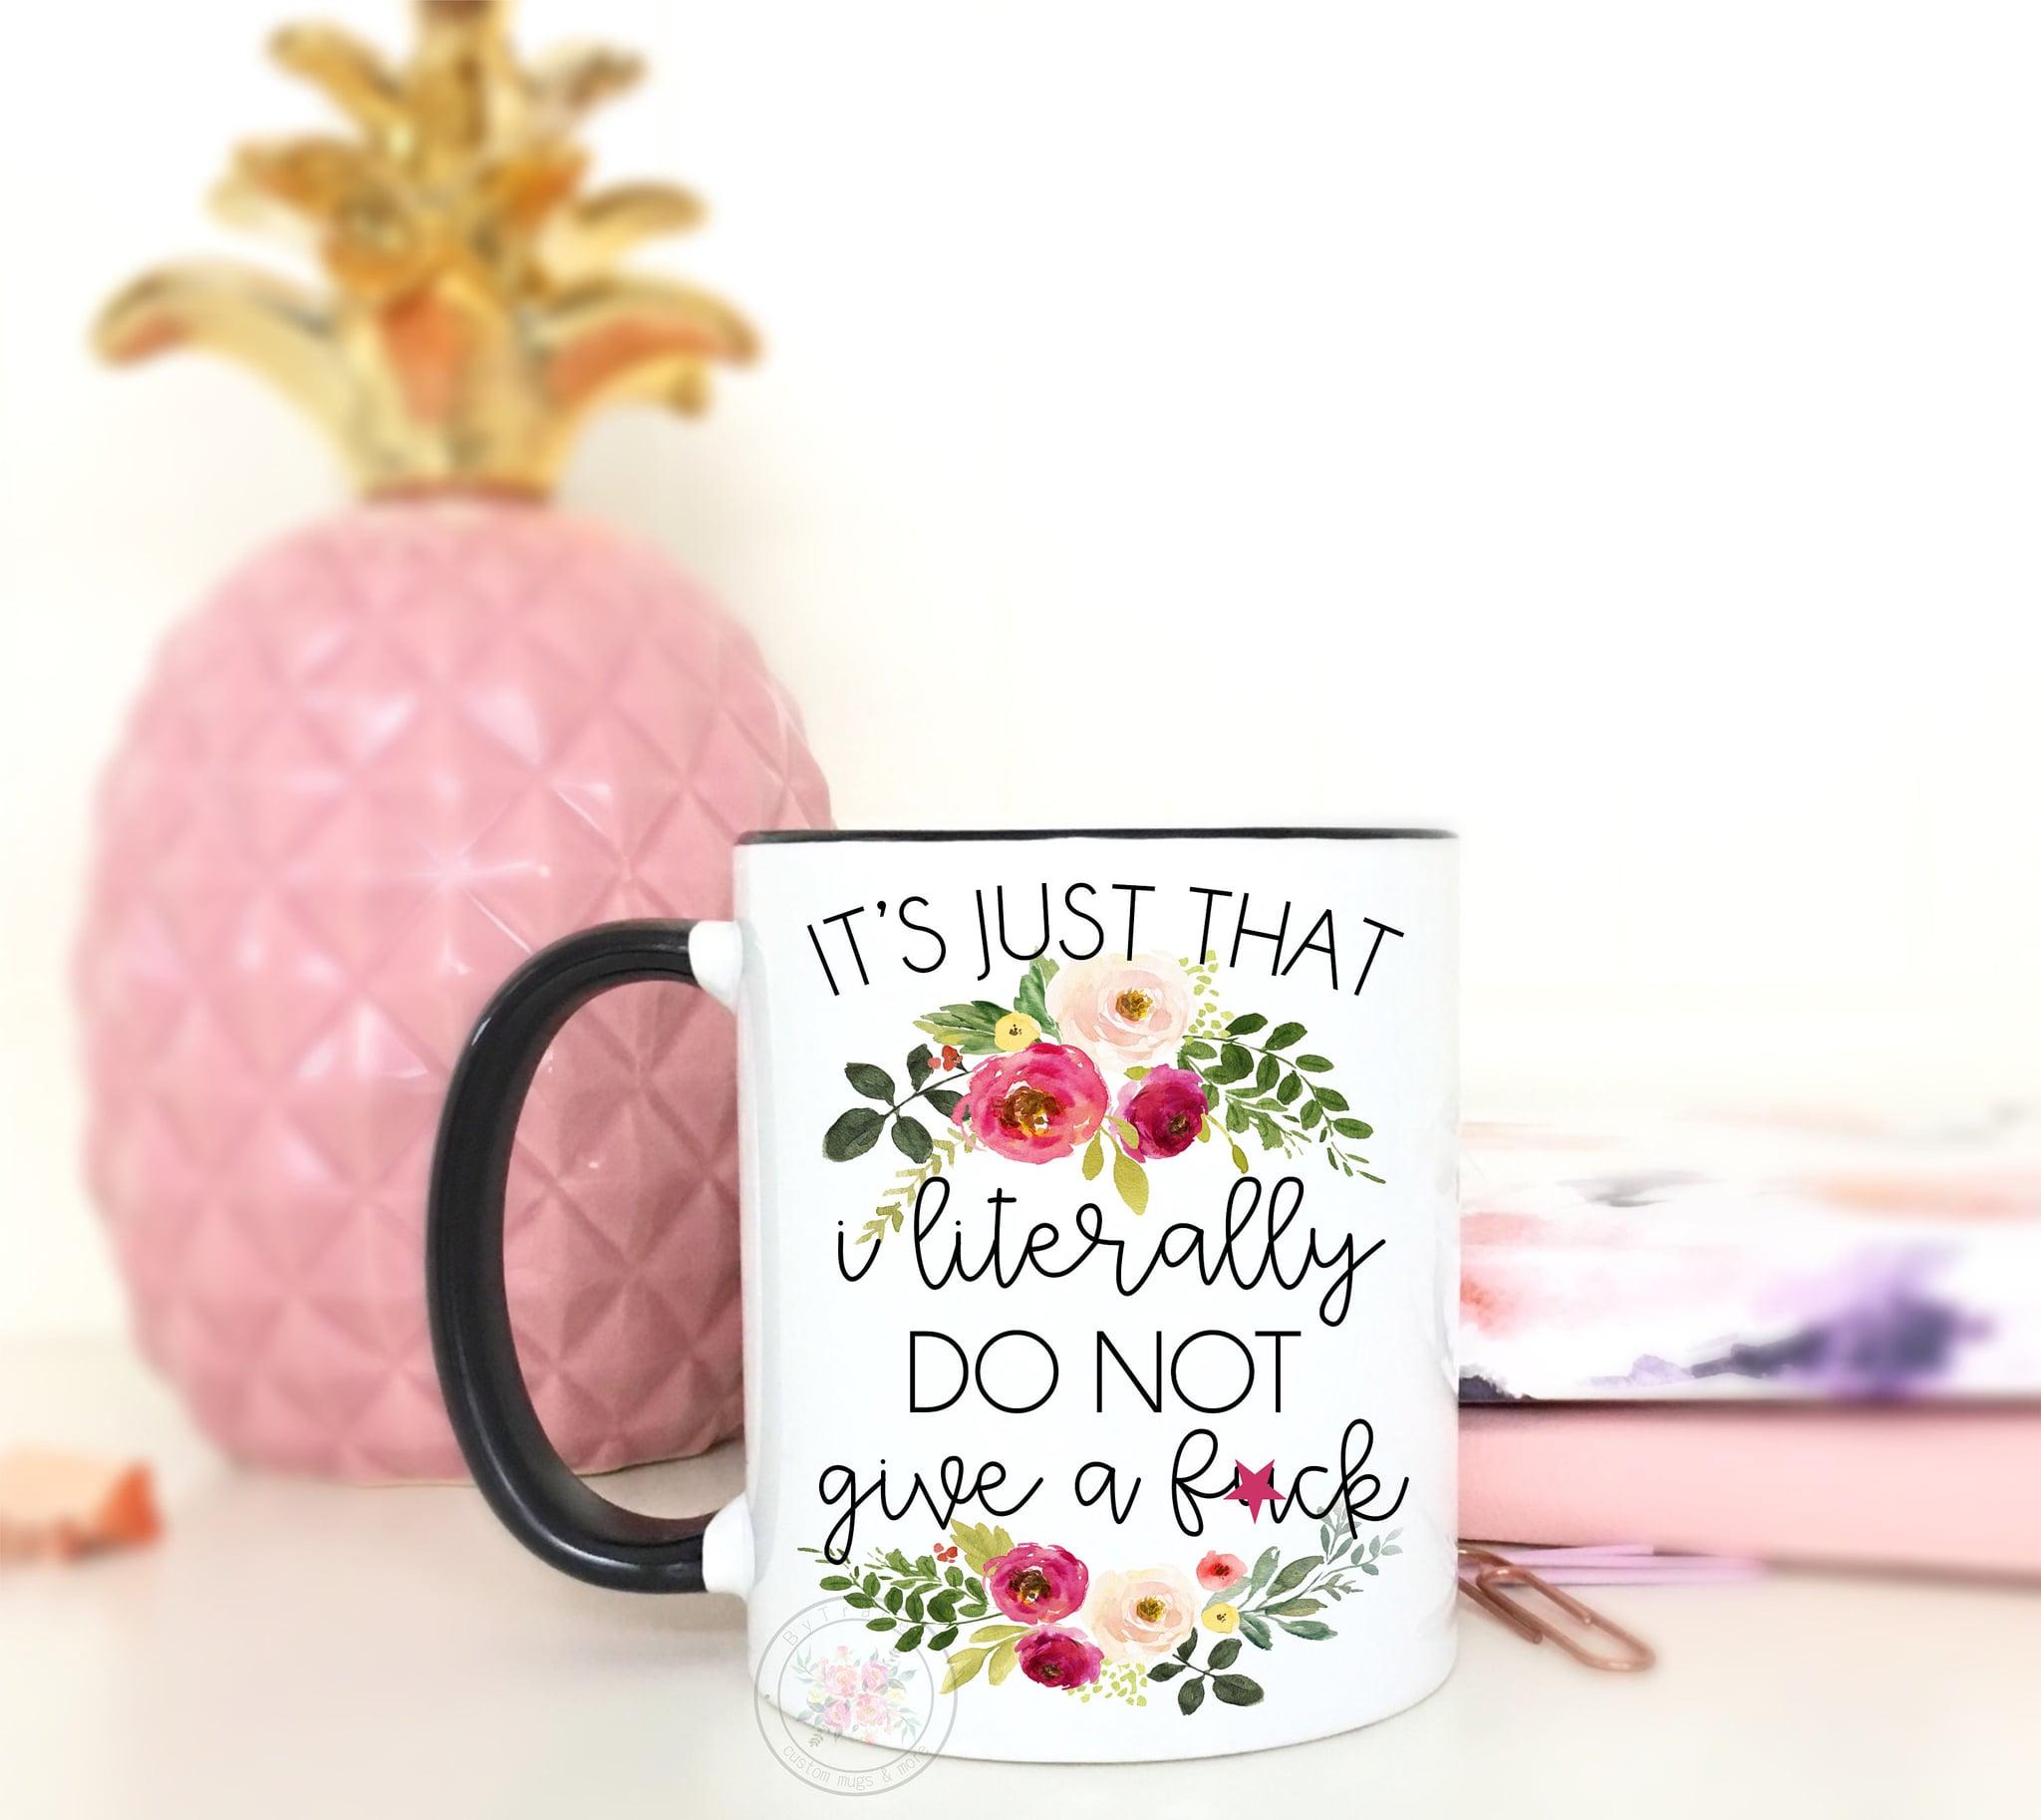 F Bomb Mom Swear Word Gift Mug F Bomb Mug Swear Mug Coffee Mug Gift Mug Tea Cup